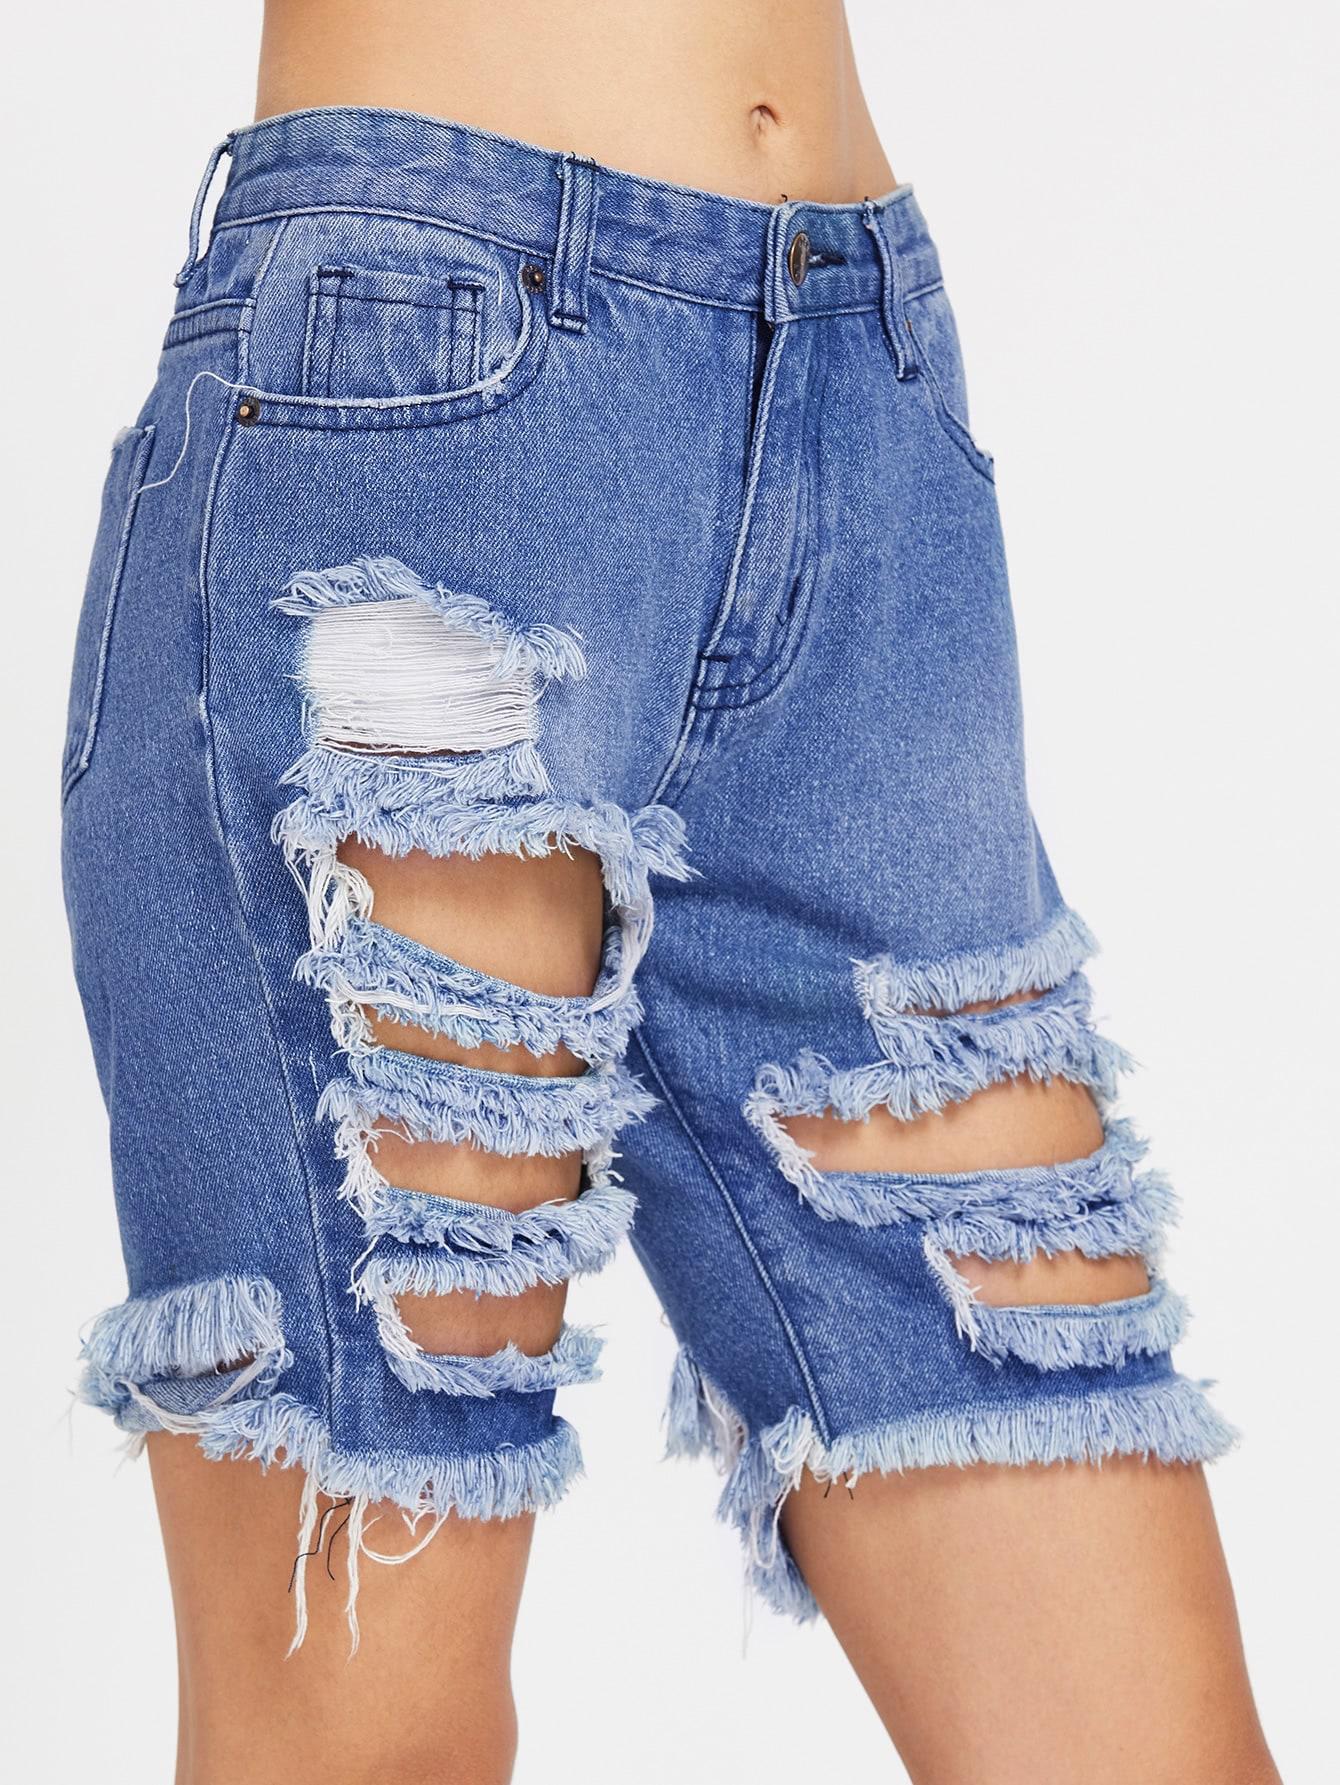 5 Pocket Distressed Denim Shorts shorts170406451